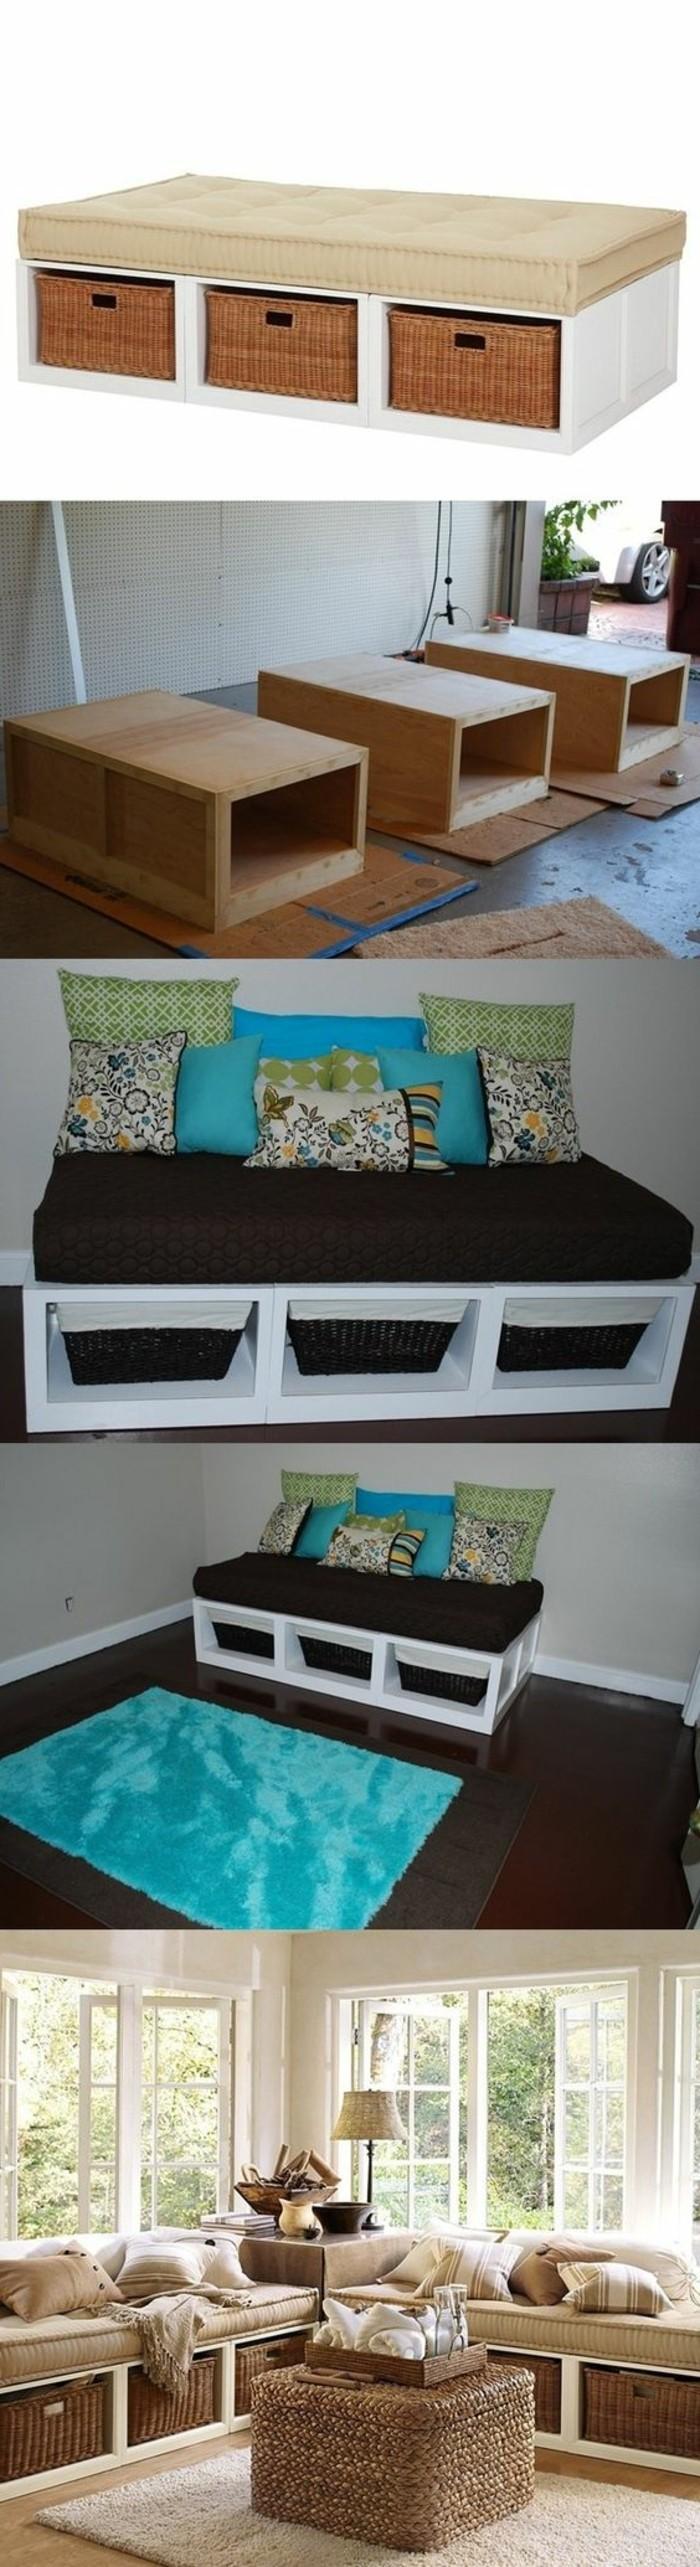 diy-moebel-kreative-wohnideen-sofa-aus-holz-und-geflochtenen-koerben-selber-baeuen